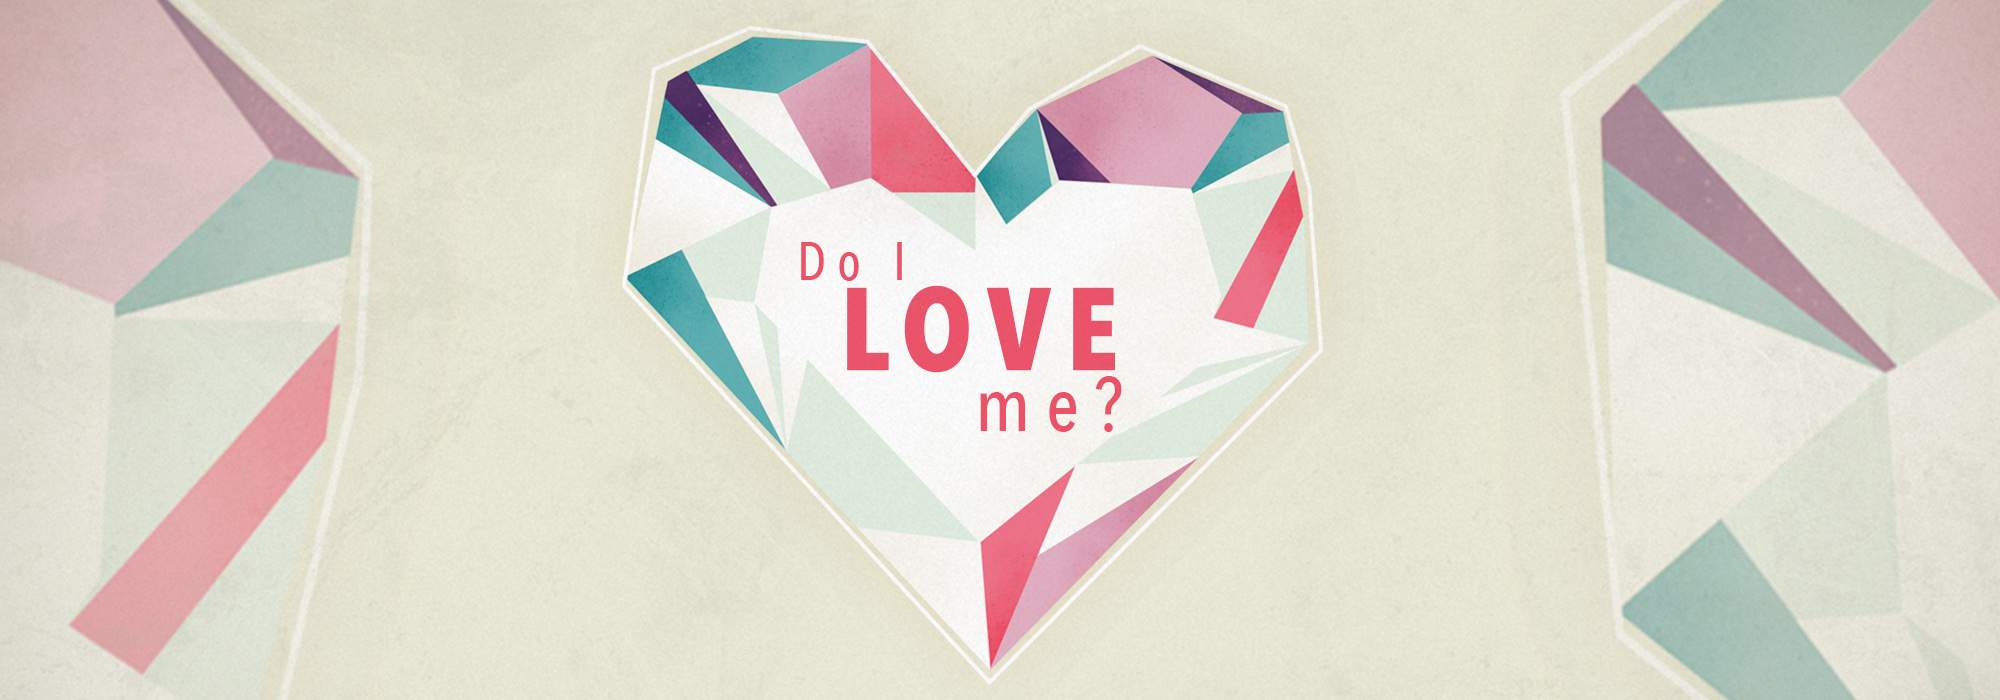 Do I Love Me?